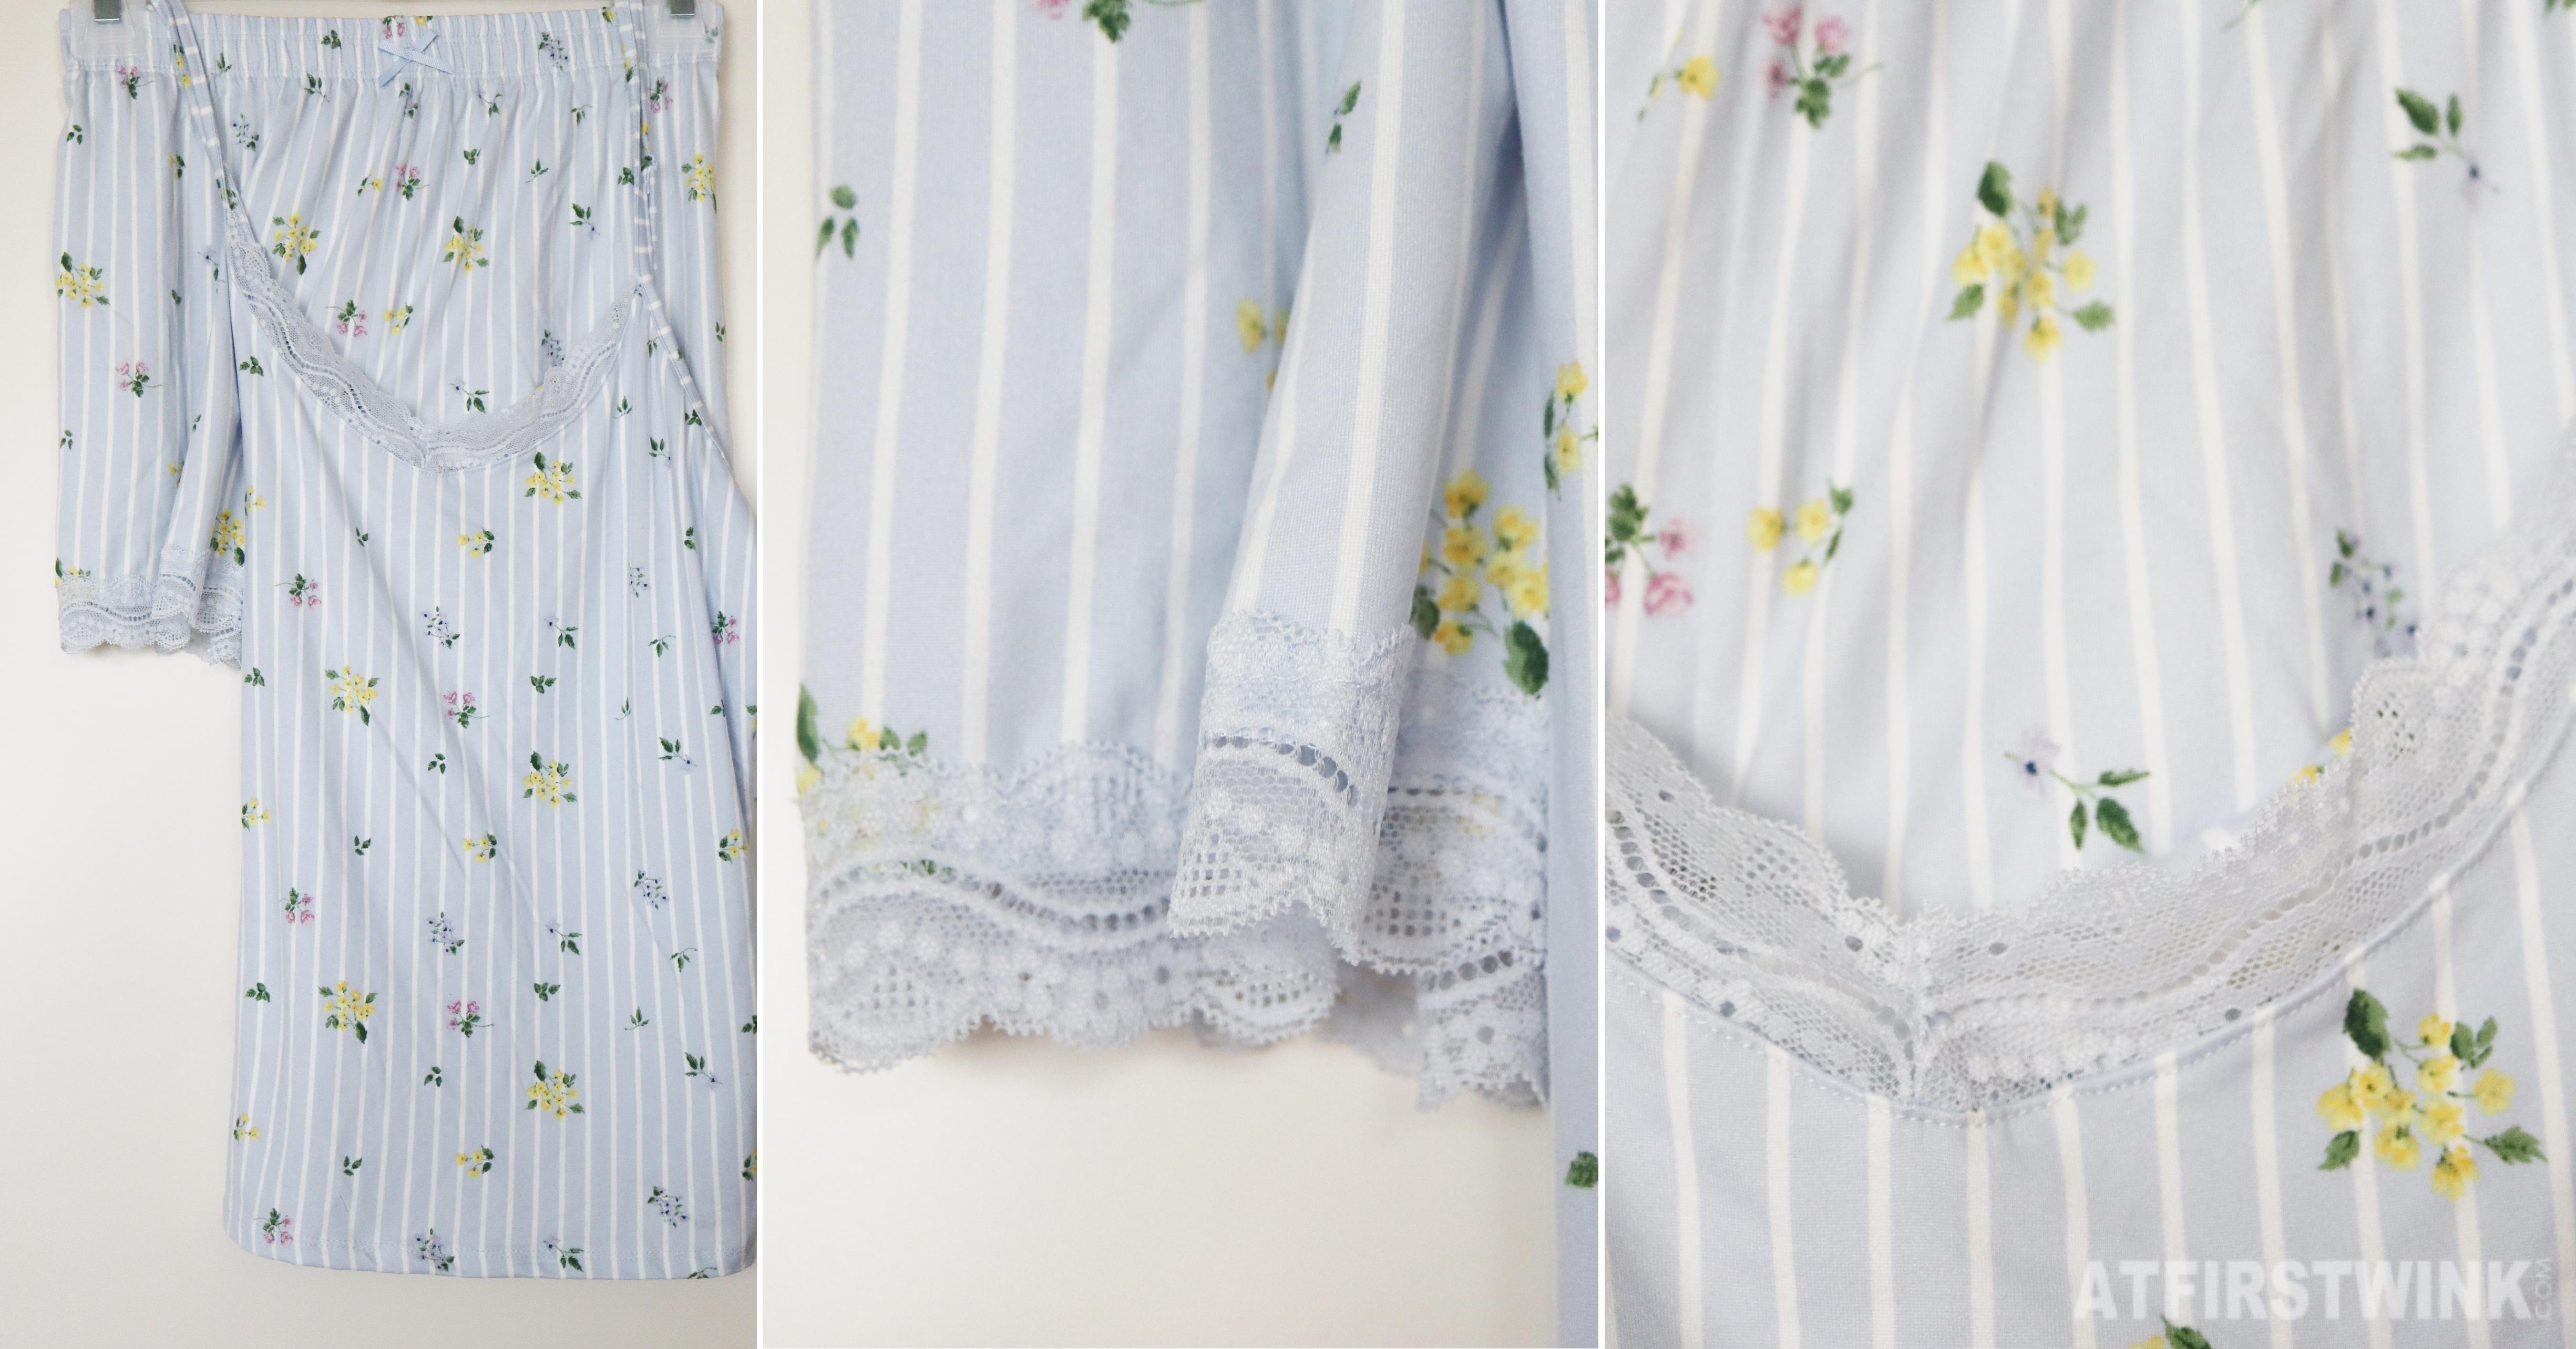 Primark light blue striped two piece pajama set vintage flower print lace